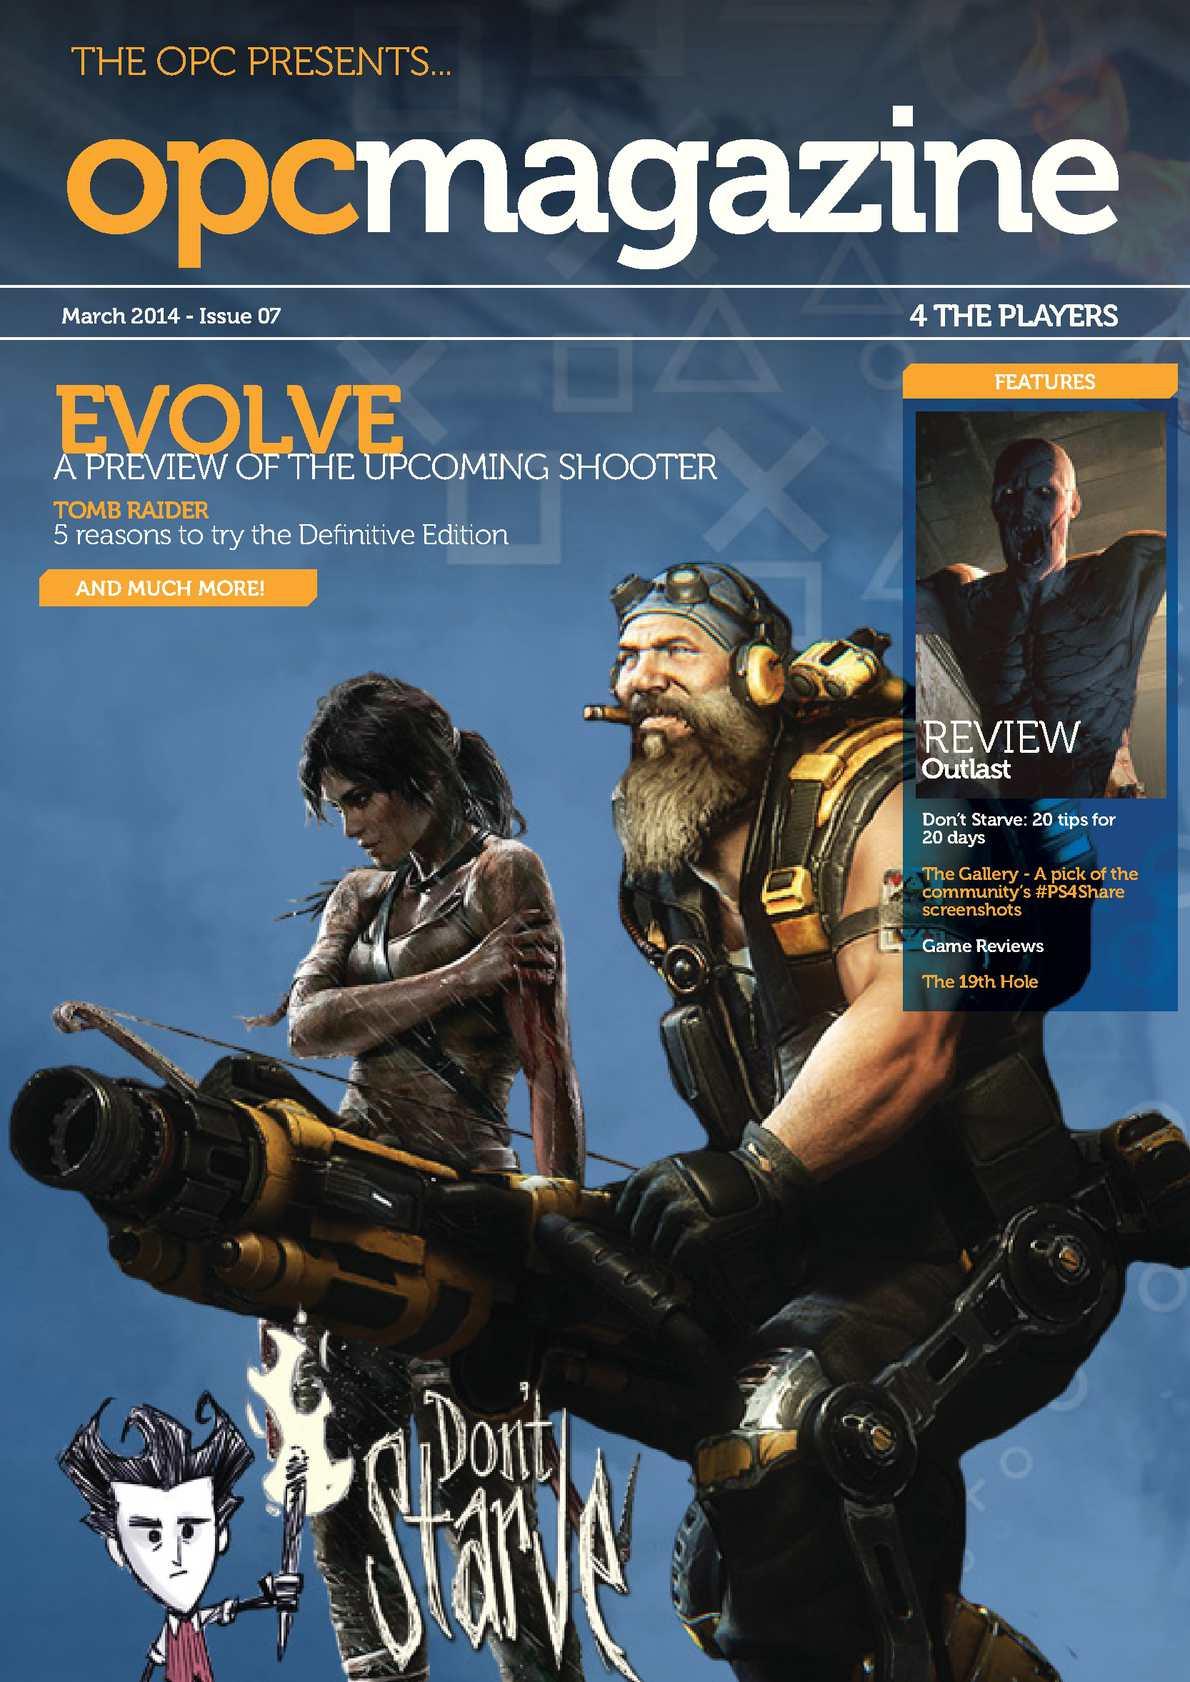 OPC Magazine - Issue 07